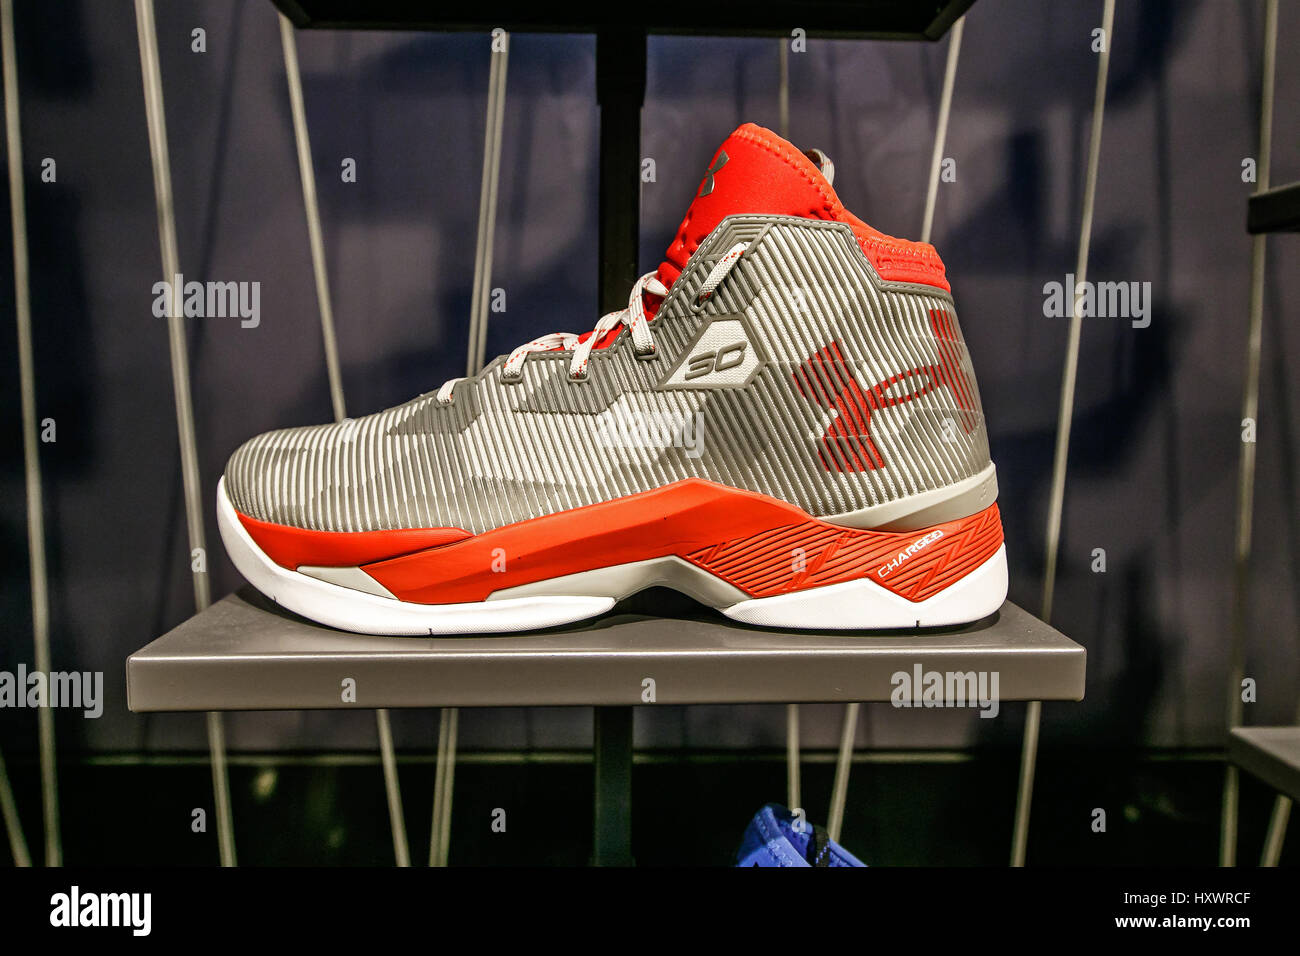 Basketball Schuhe Stockfotos & Basketball Schuhe Bilder Alamy